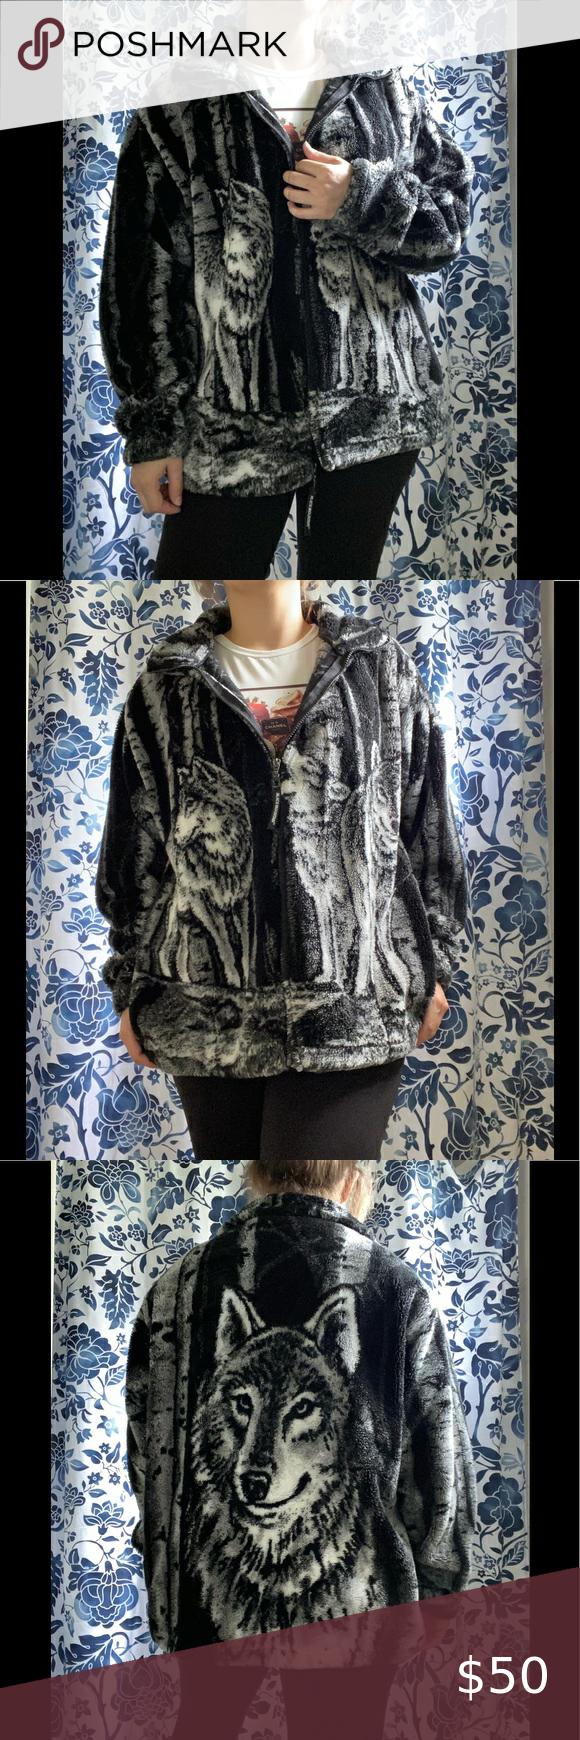 Vtg Wolf Print Teddy Jacket In 2020 Vintage Jacket Jackets Clothes Design [ 1740 x 580 Pixel ]